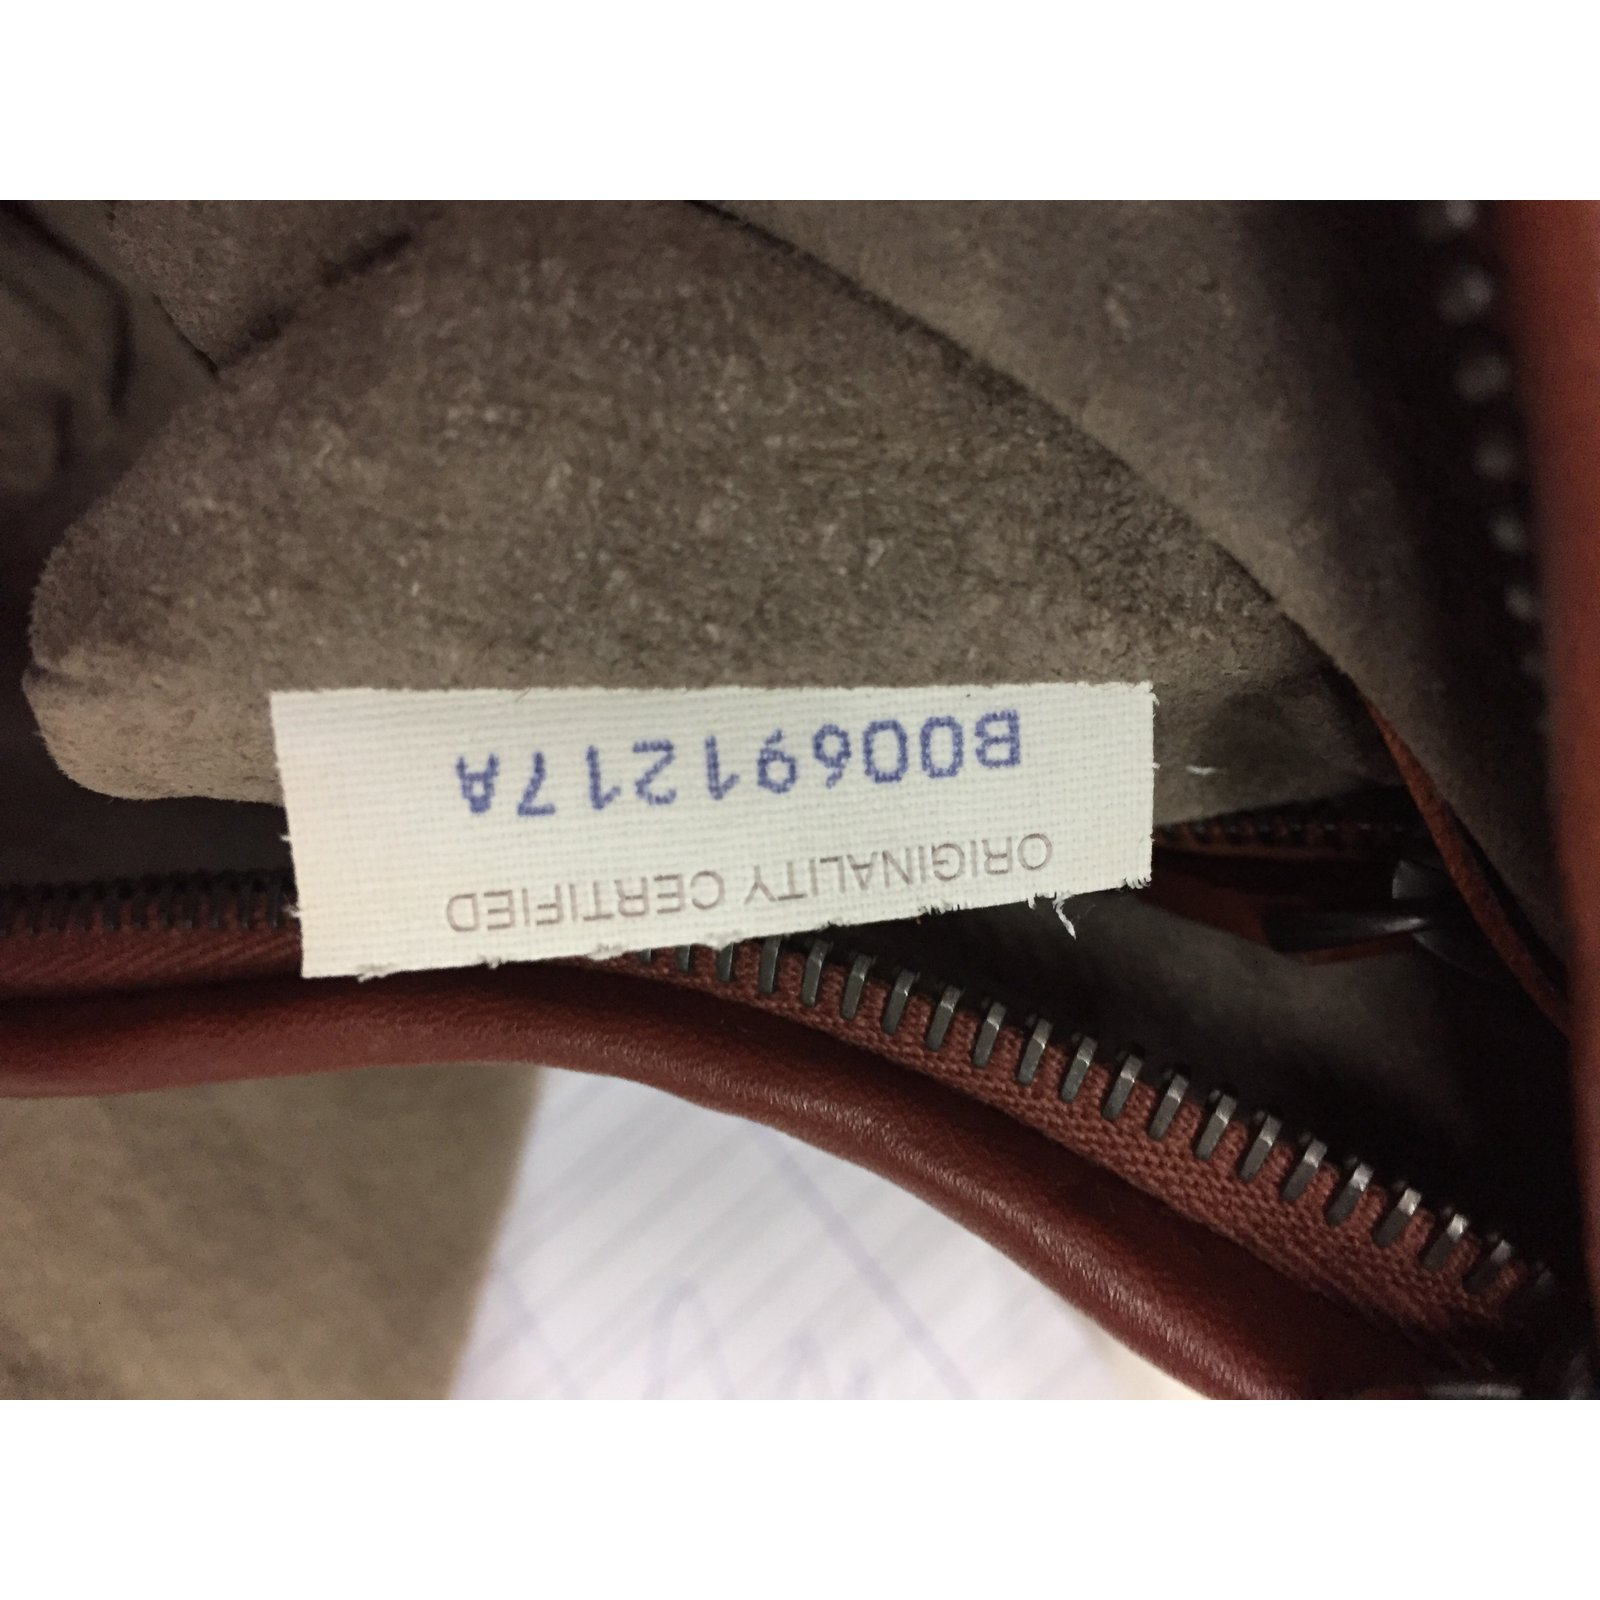 ebb4015045 Facebook · Pin This. Bottega Veneta Handbag Handbags Leather Brown ref.28856